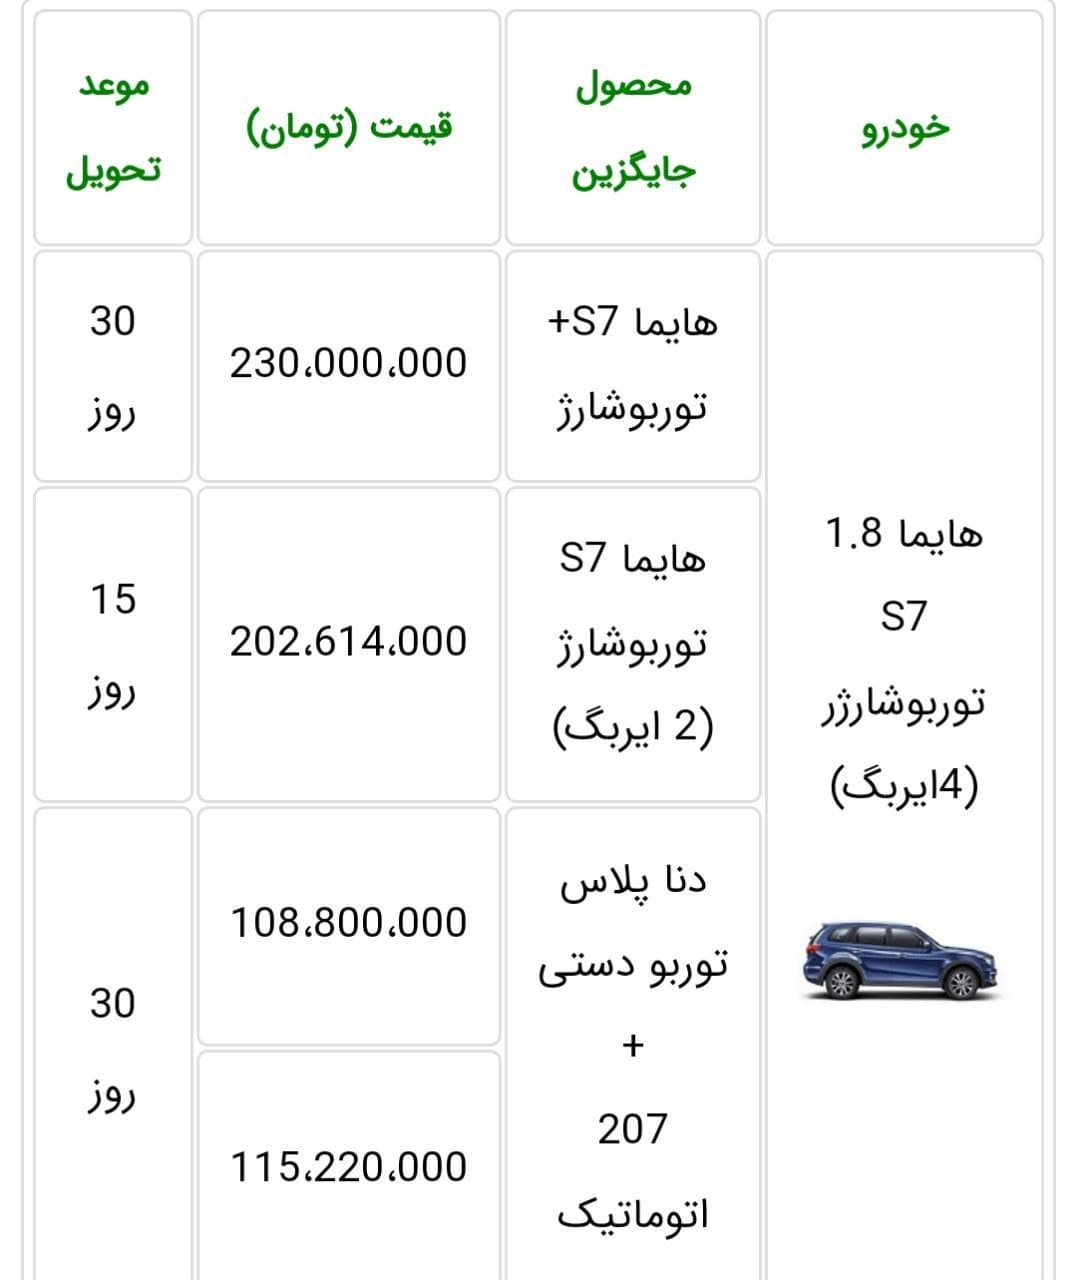 طرح تبدیل خودروهایما S7 توربوشارژ